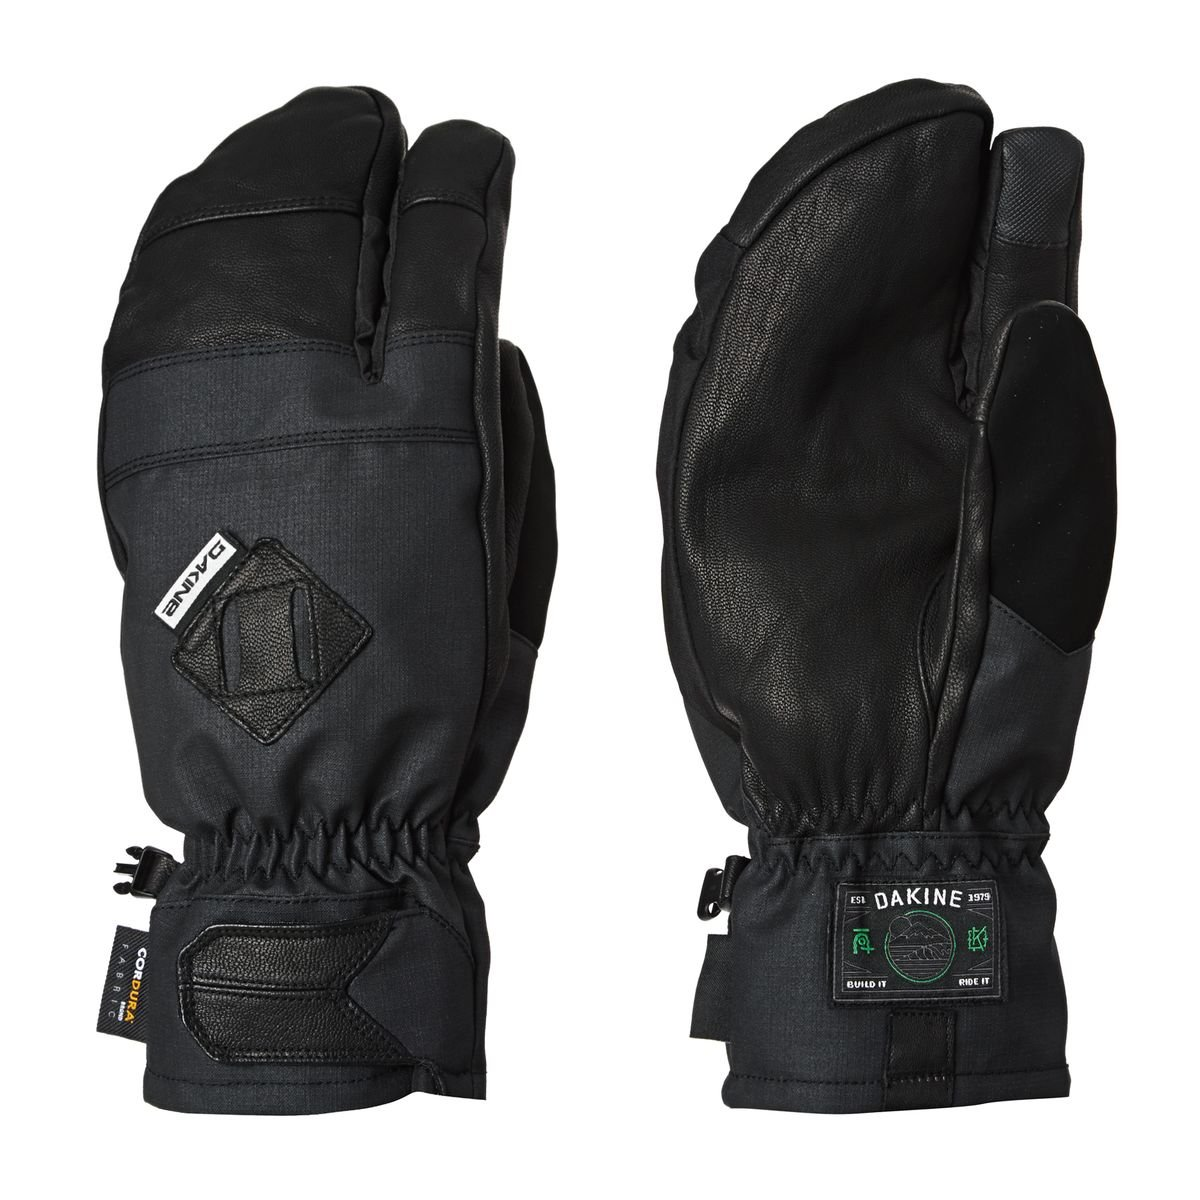 Dakine Fillmore Snowboard AESMO Mitt or Ski Finger Trigger